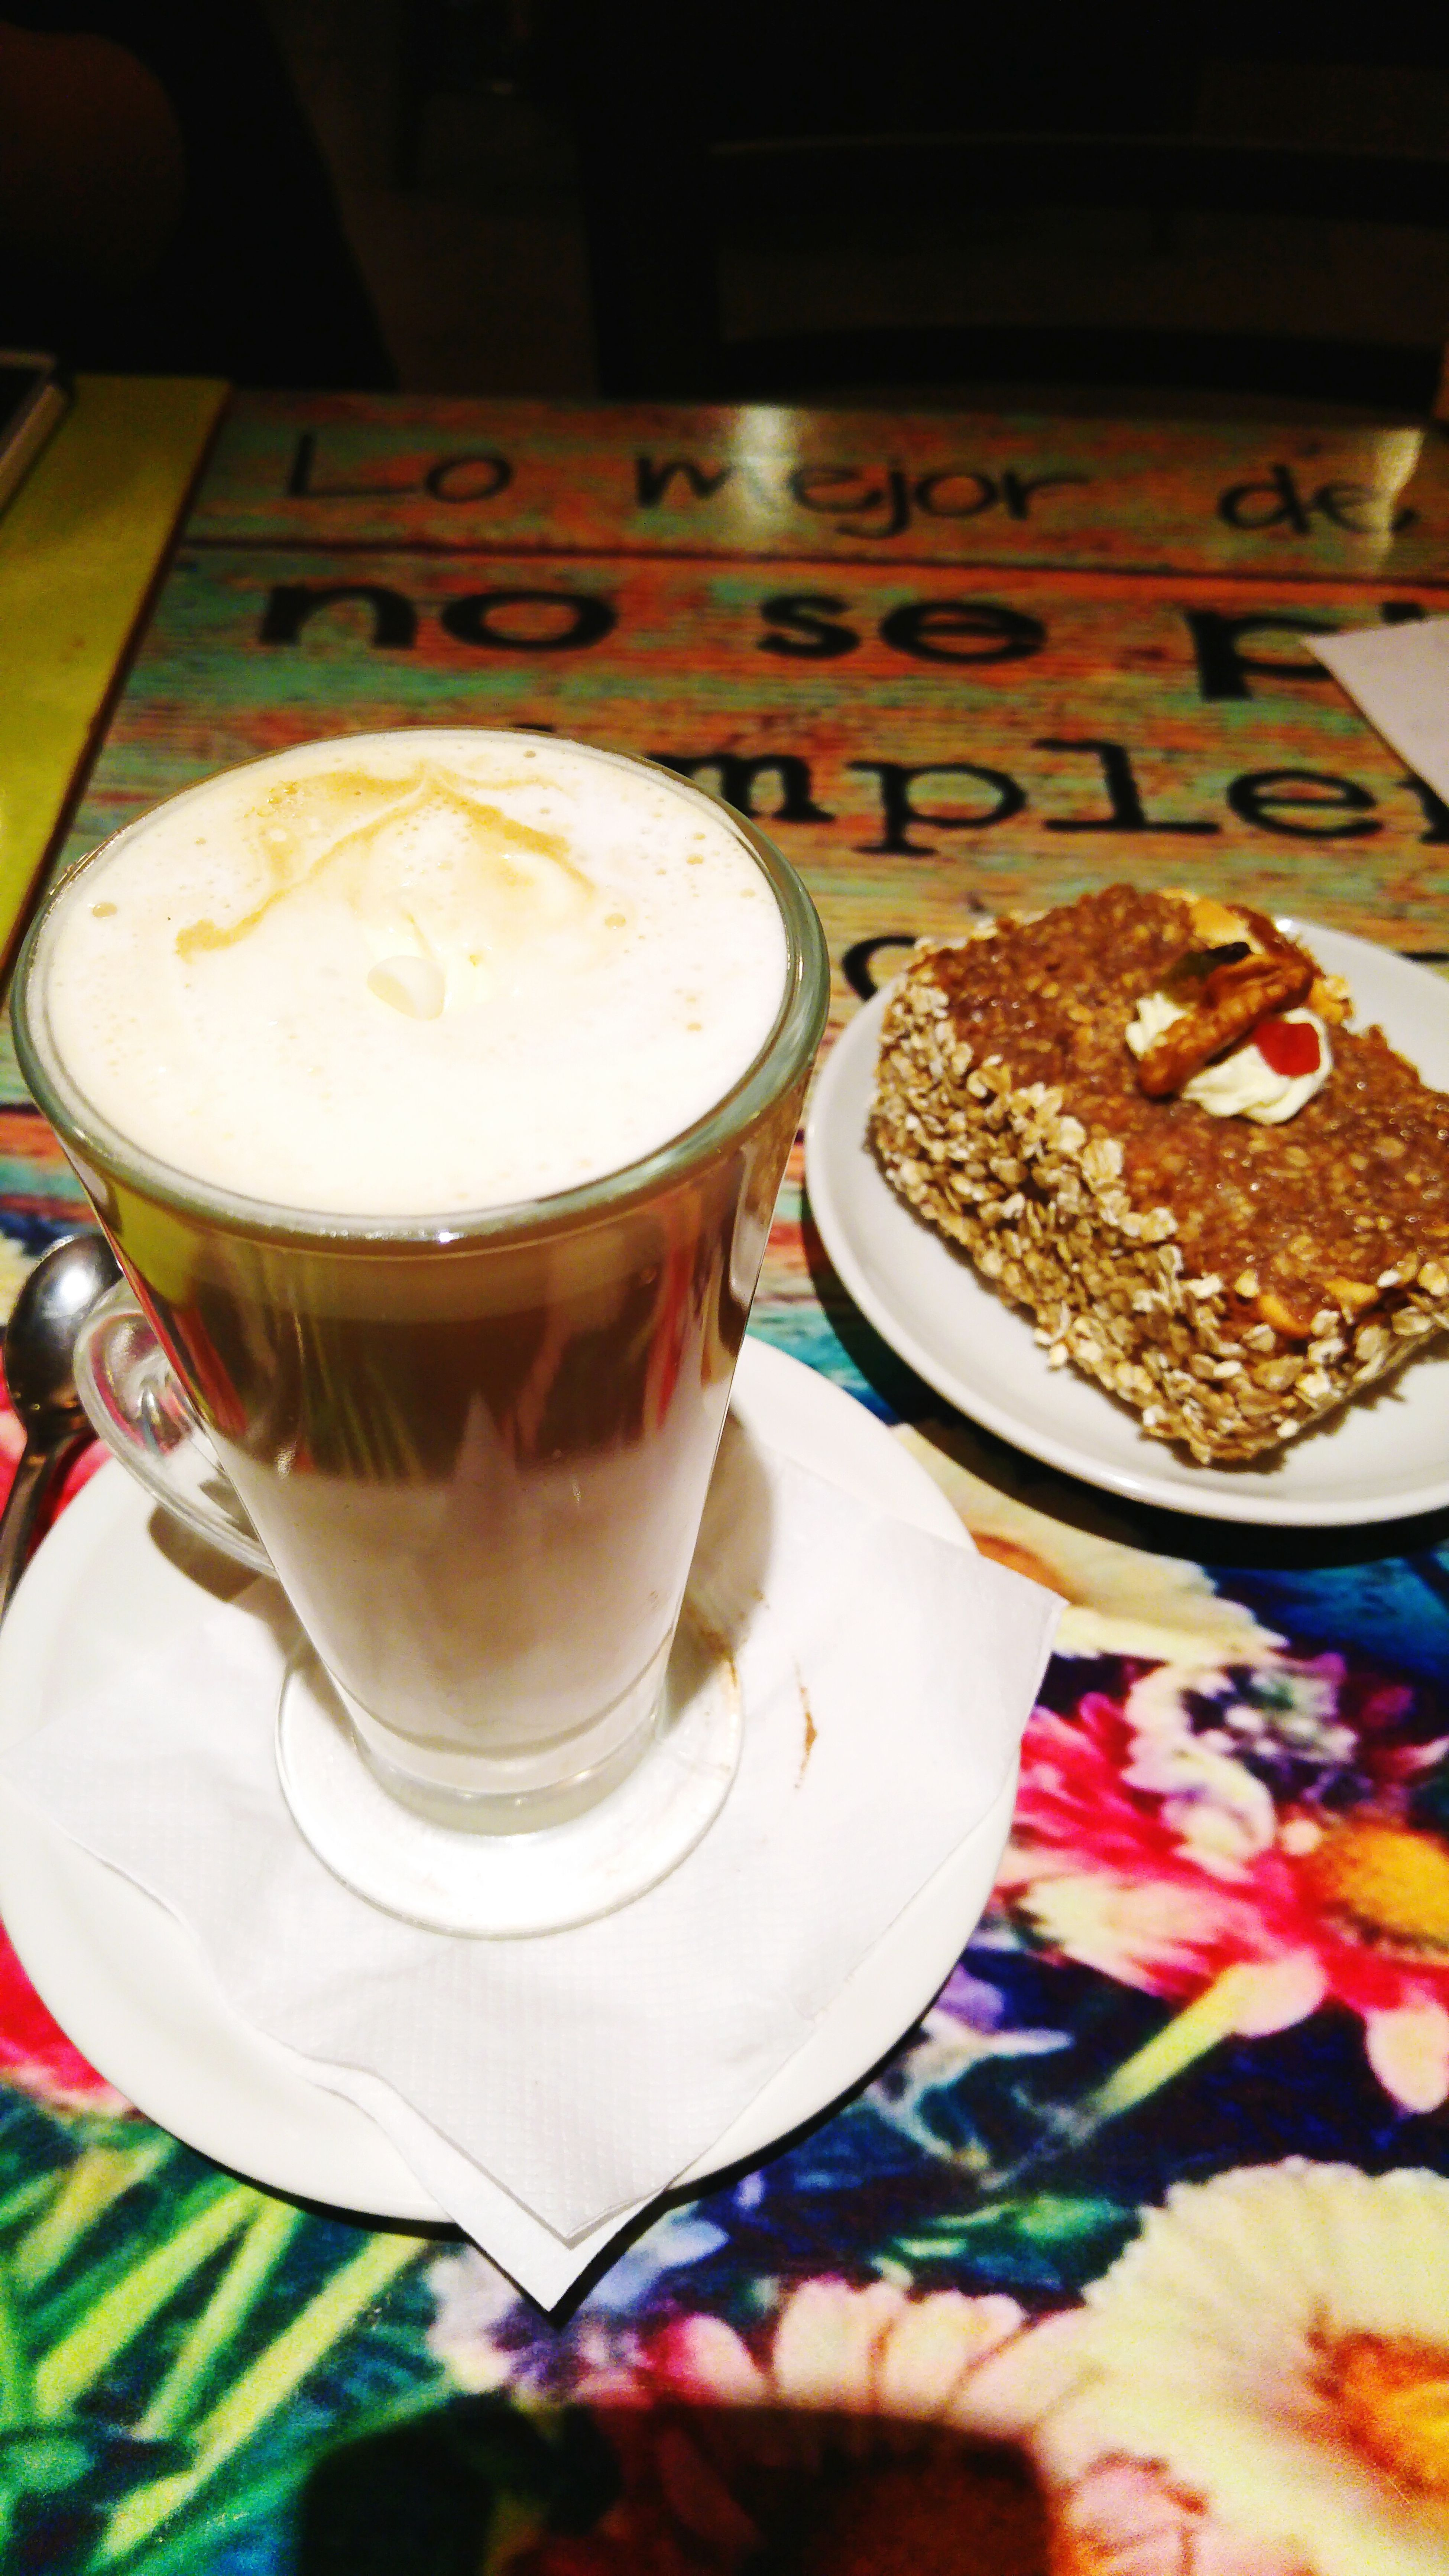 /Late/ Coffee Time Coffeelatte Cake Coffee Break Sweet Lattechocolate Latte LGG4